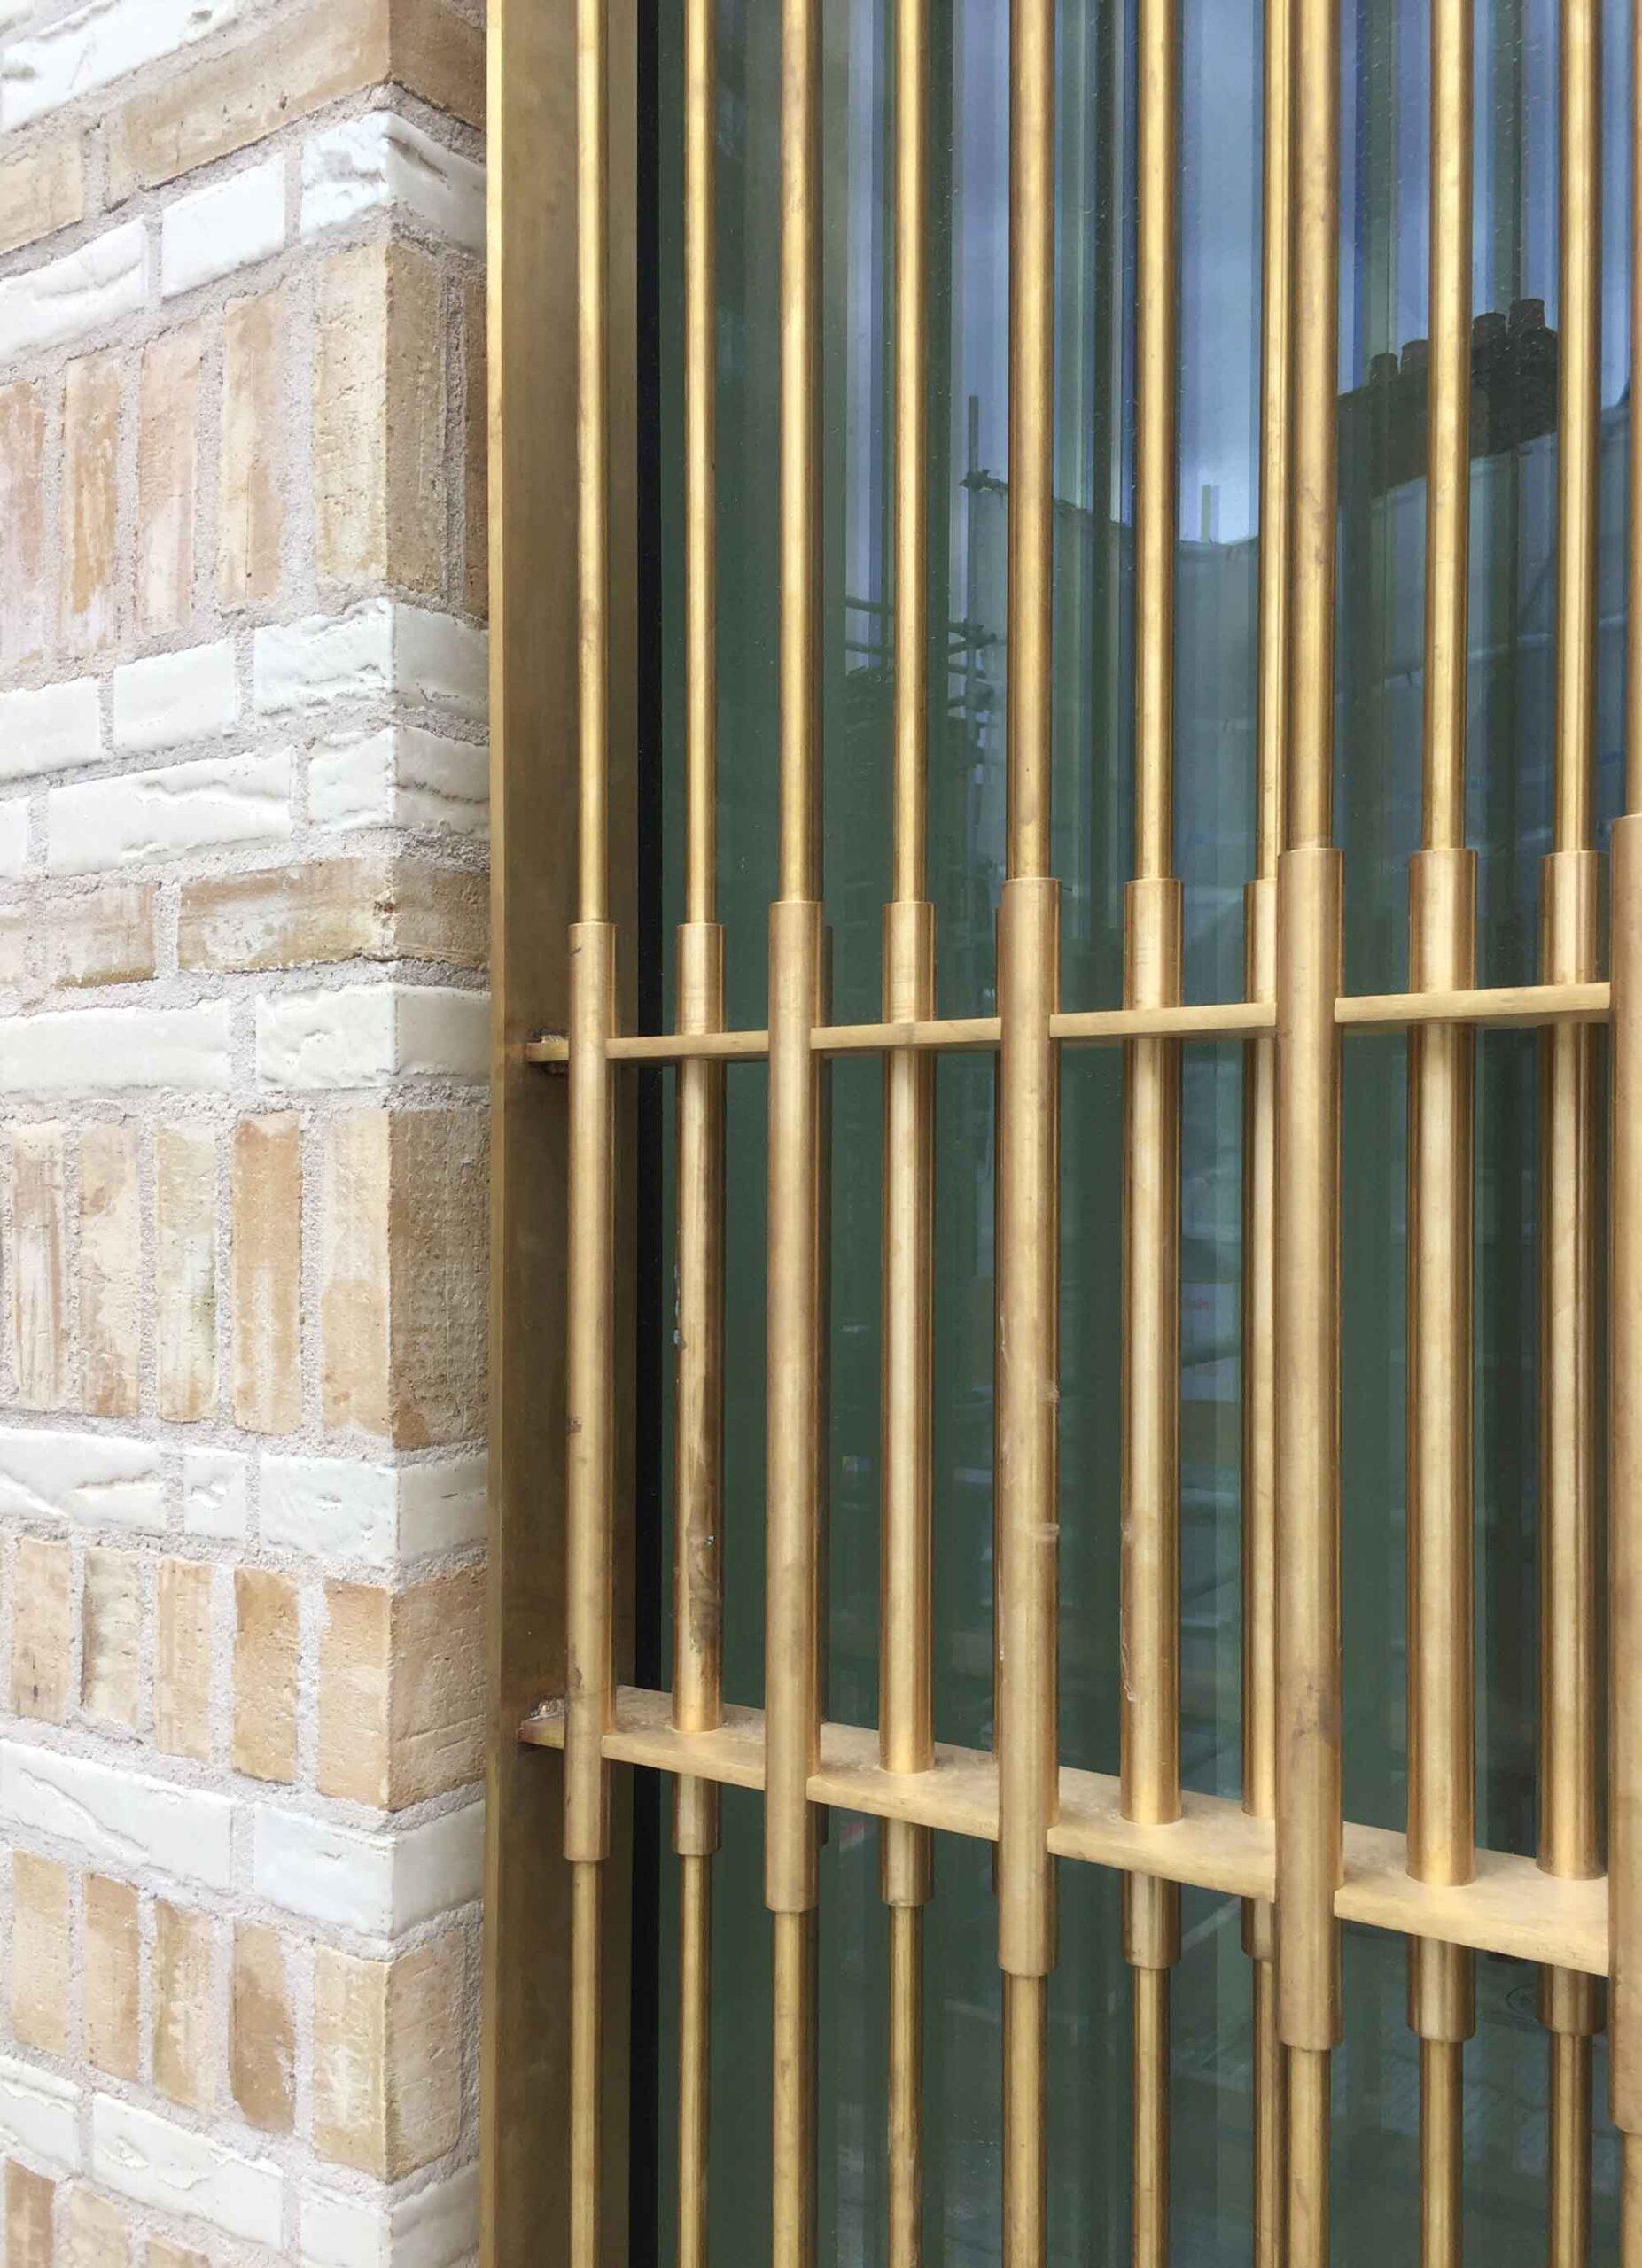 westminster-fire-station-openstudio-architect-window-metal-screen